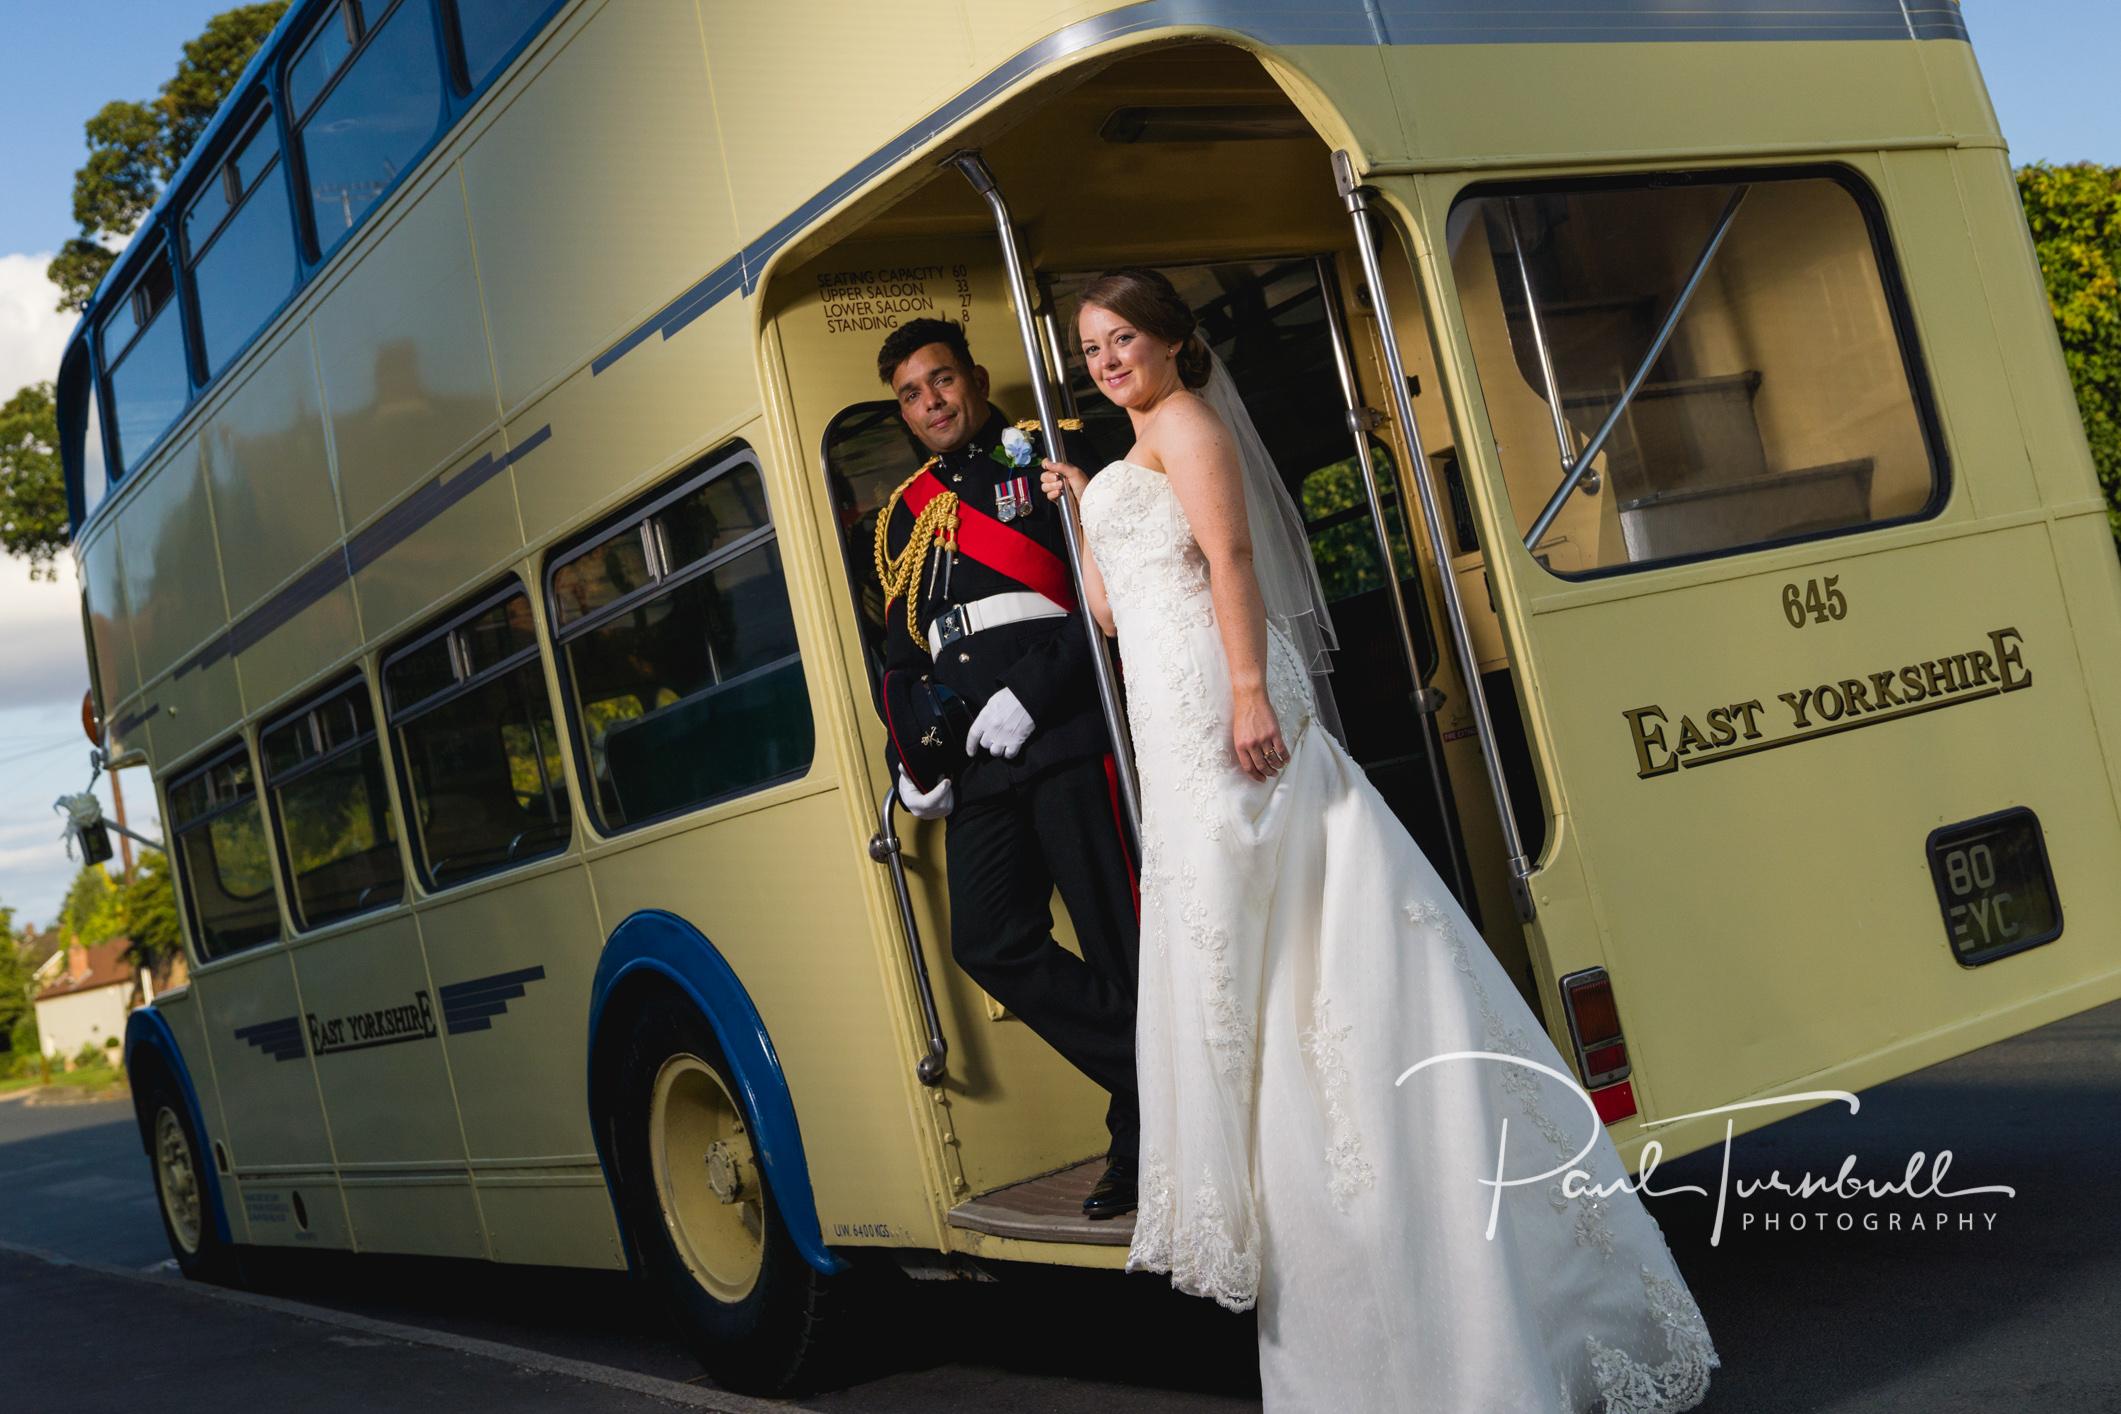 wedding-photographer-south-dalton-walkington-yorkshire-emma-james-071.jpg